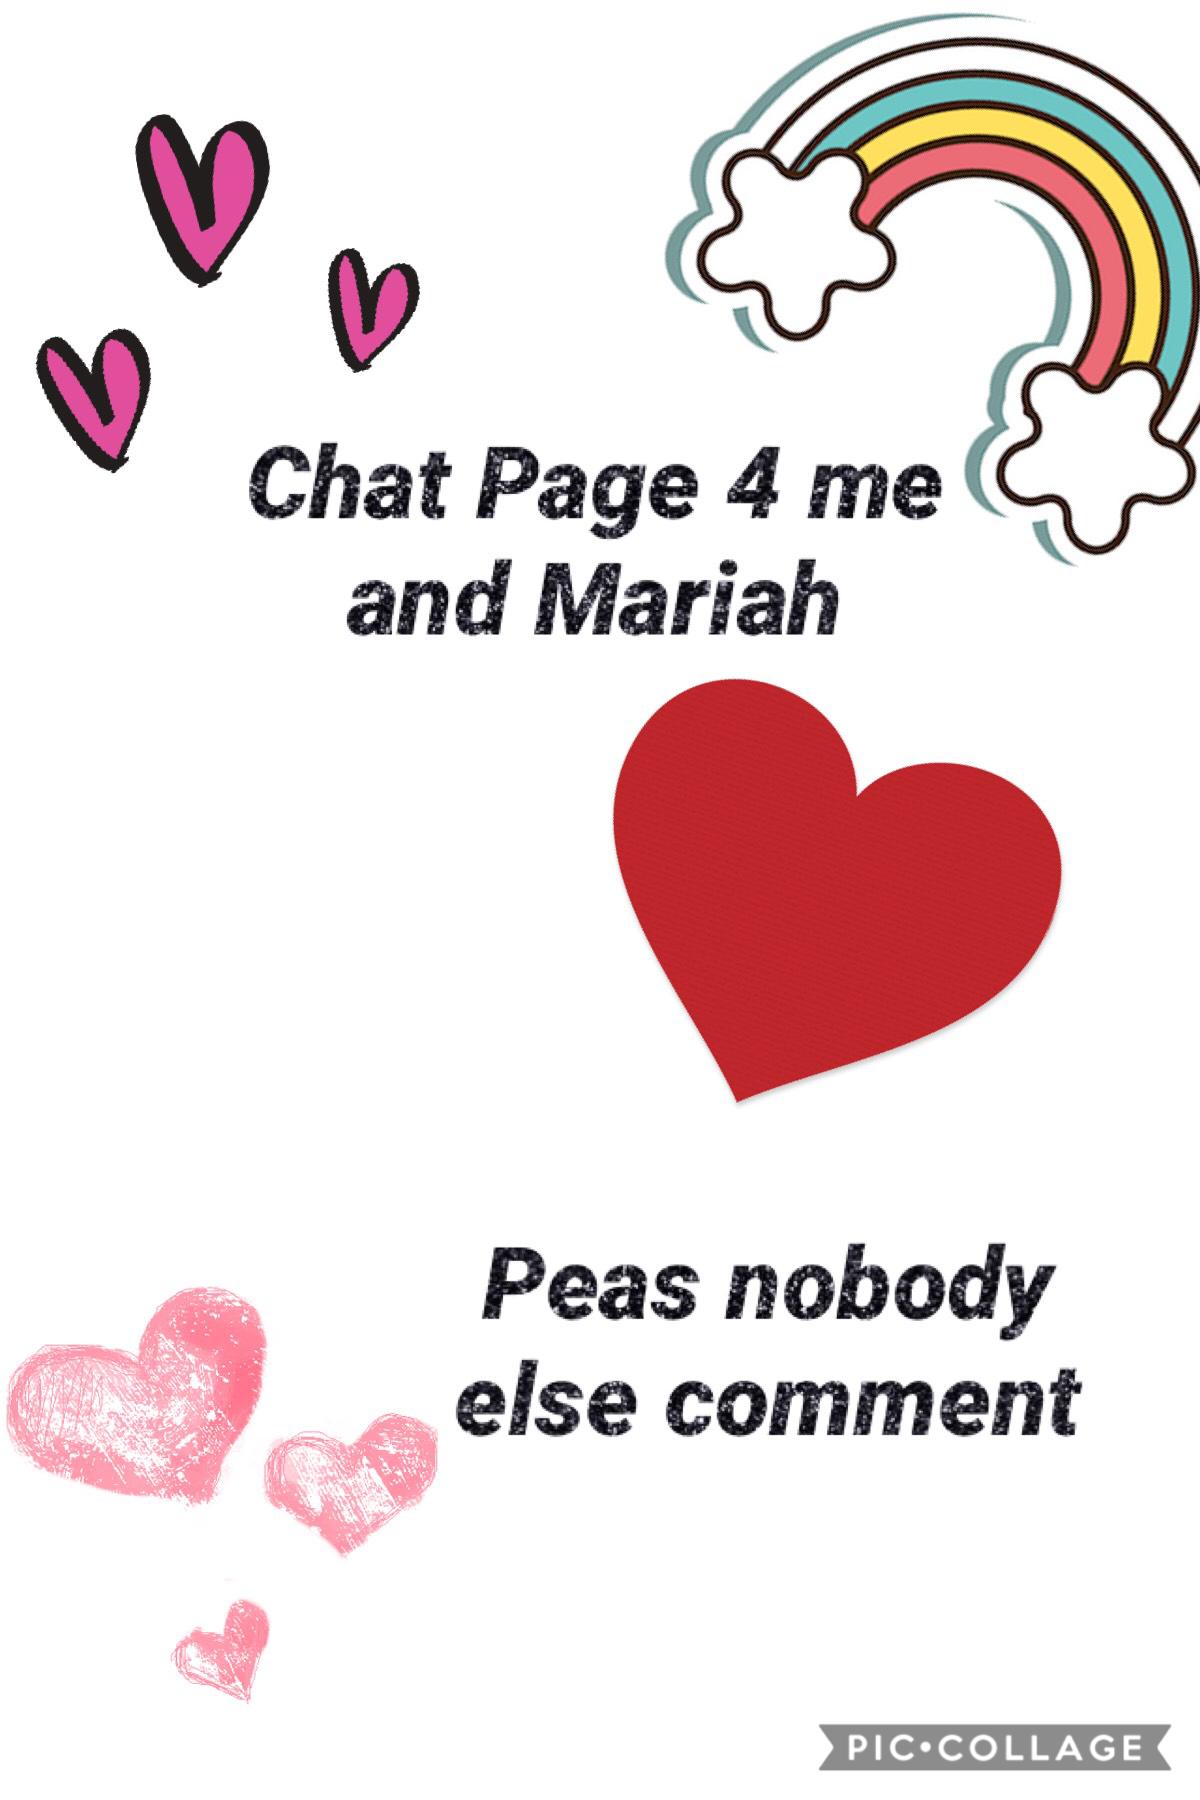 NO one else comment